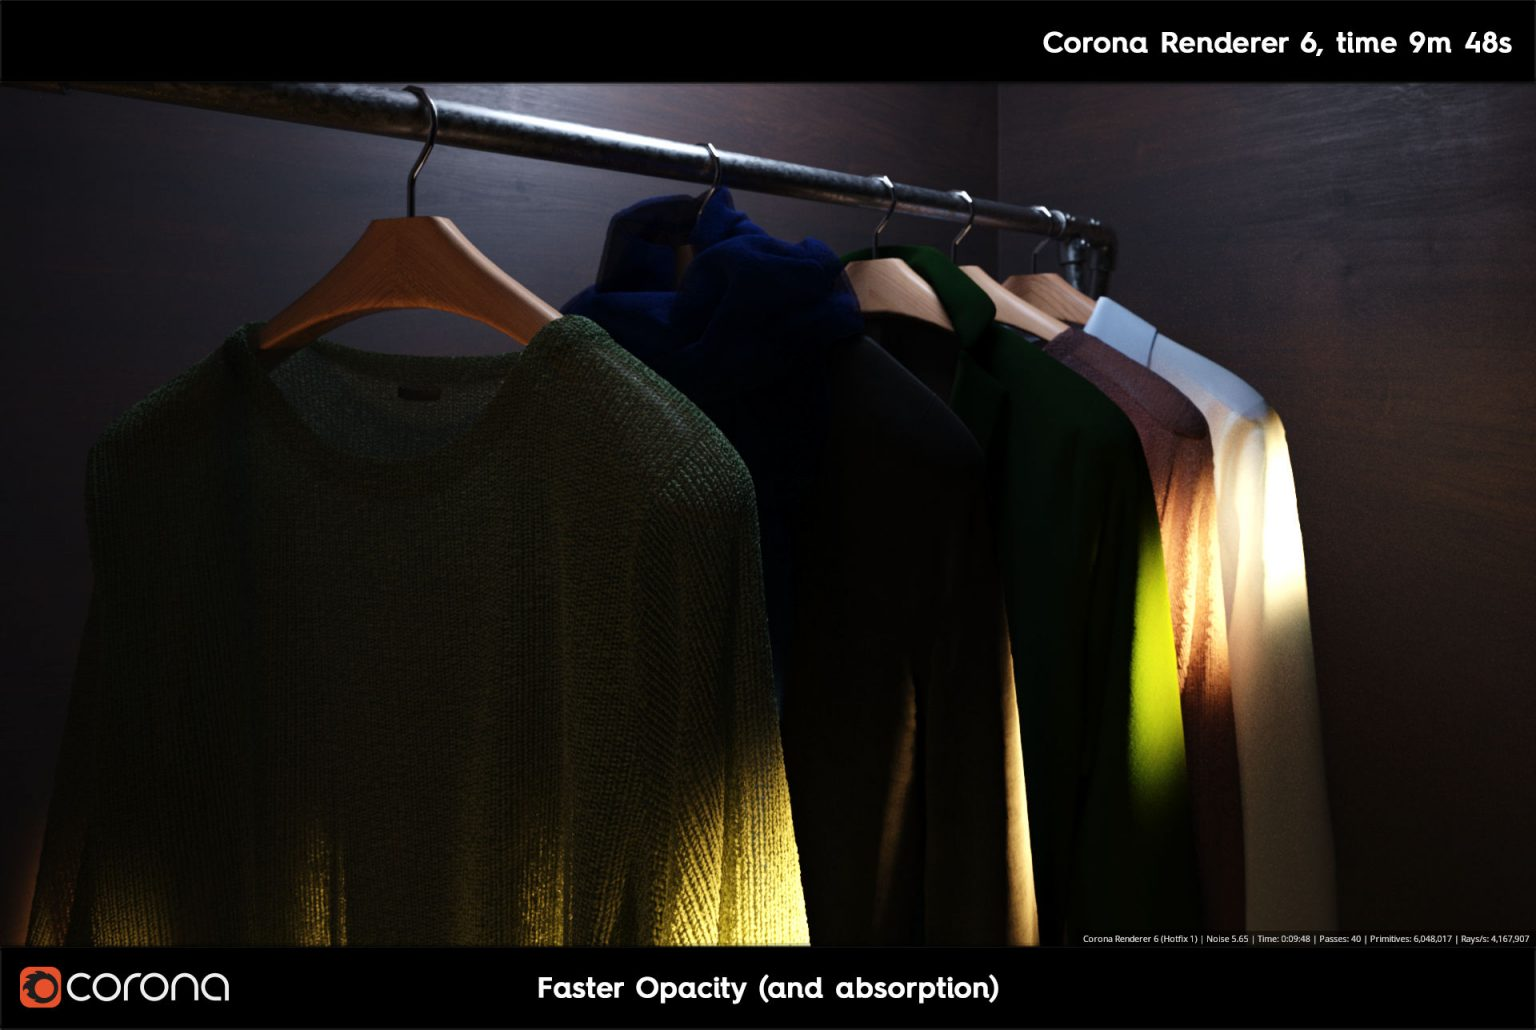 Corona Renderer 7: TUTTE LE NOVITA' - Fast Opacity B